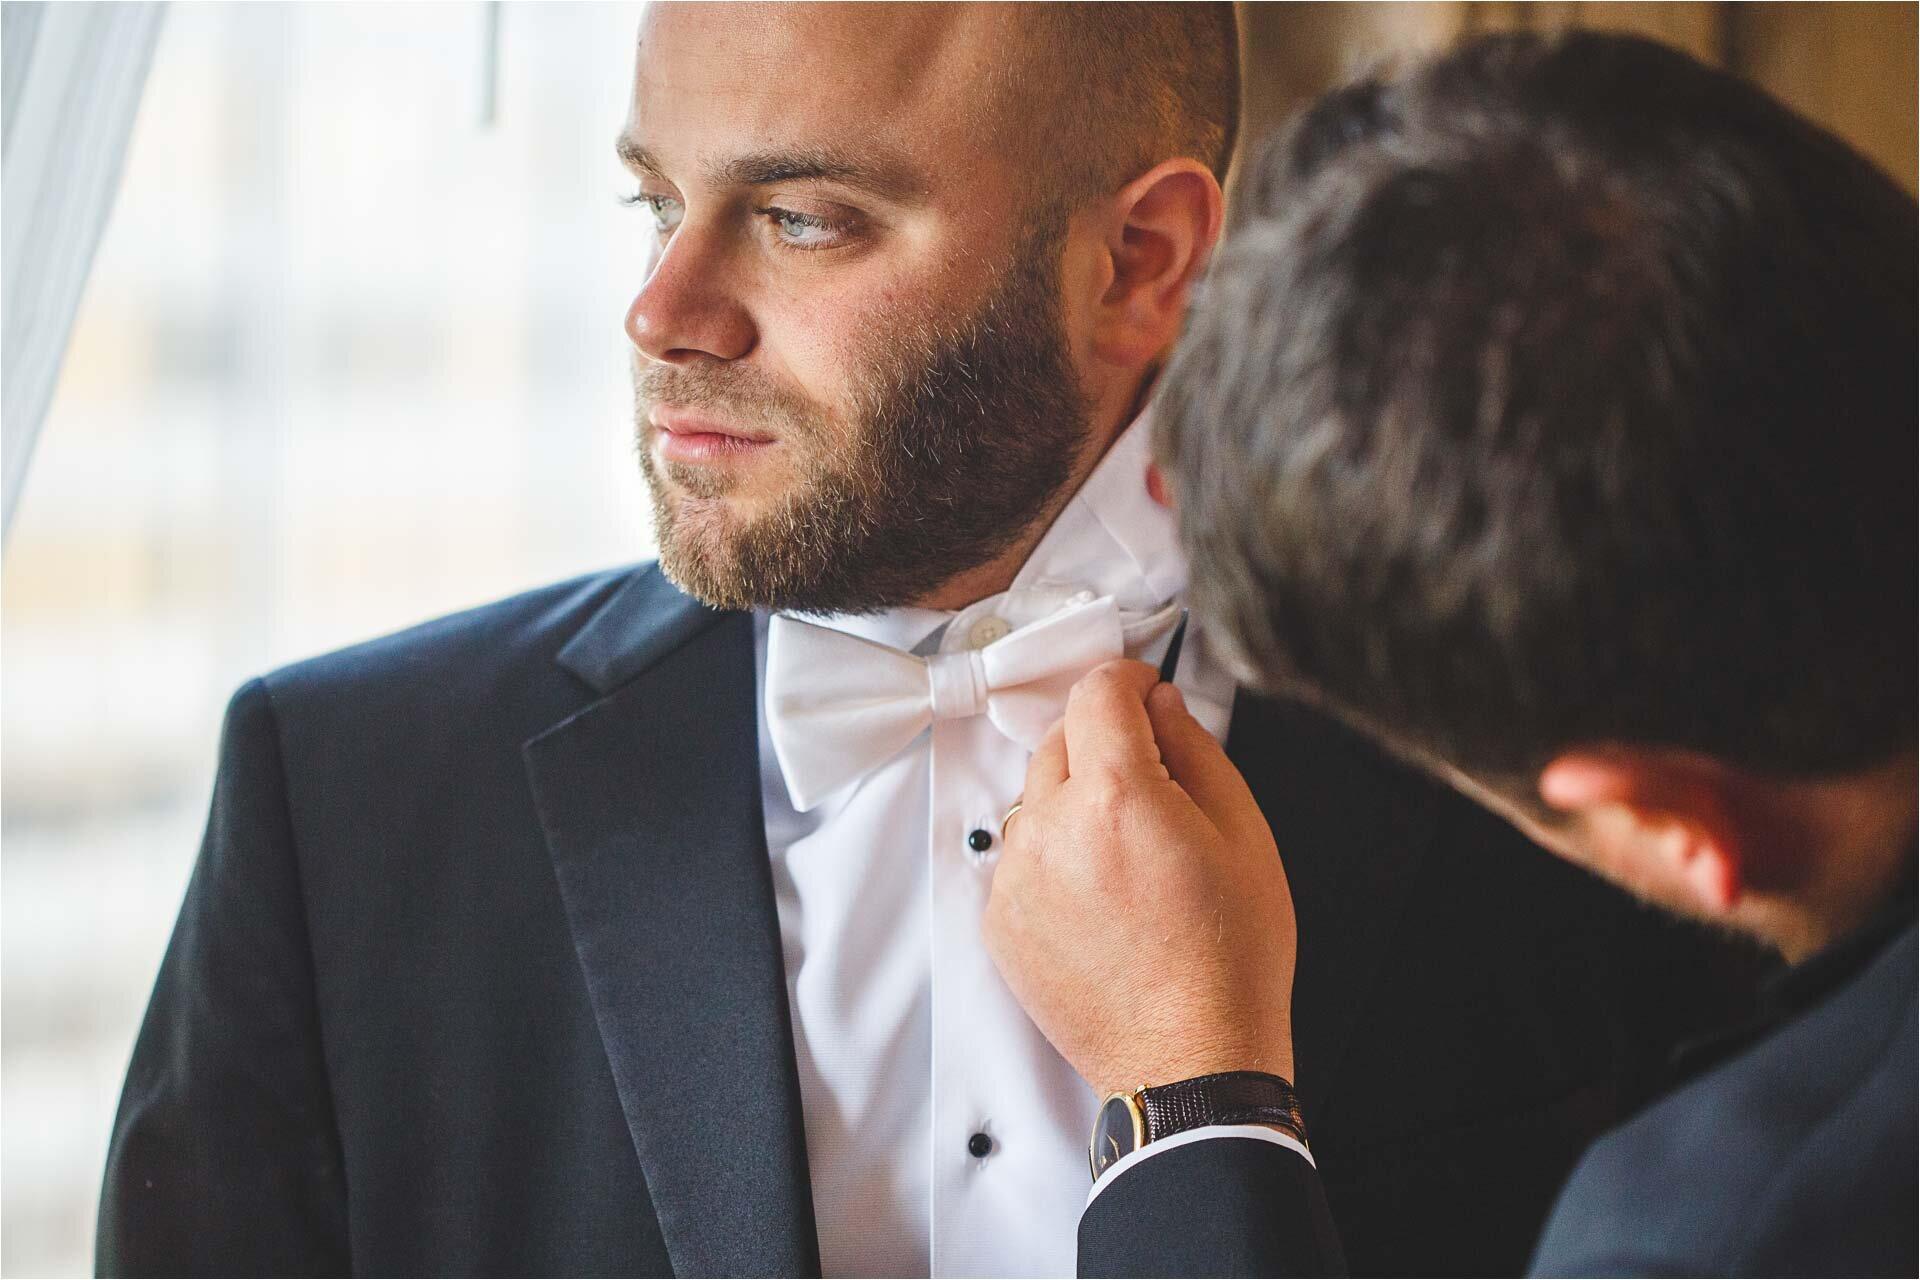 racebrook-countryclub-wedding-photography-02.jpg